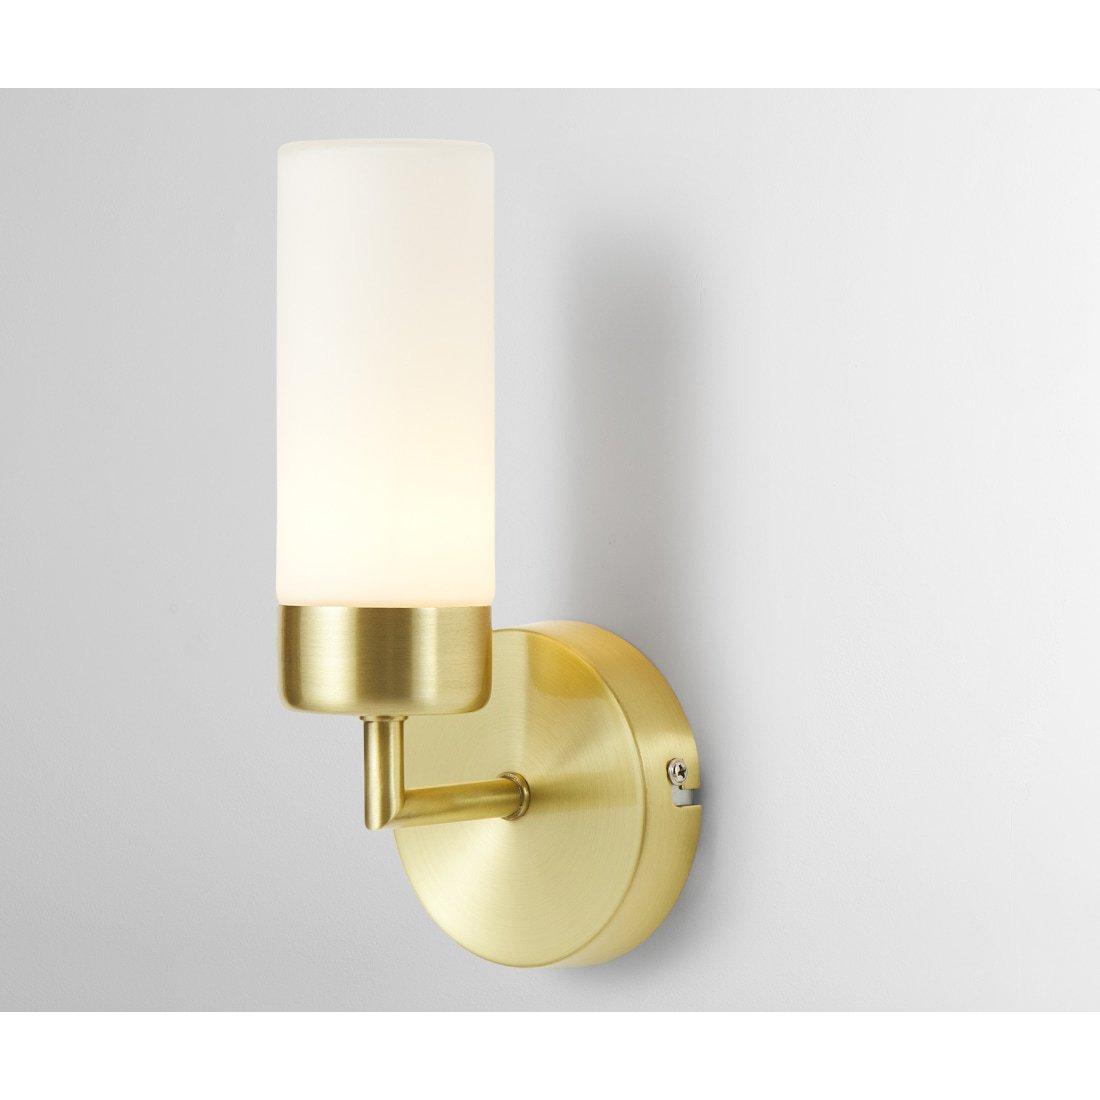 image-Eddis  Bathroom Wall Lamp, Brushed Brass